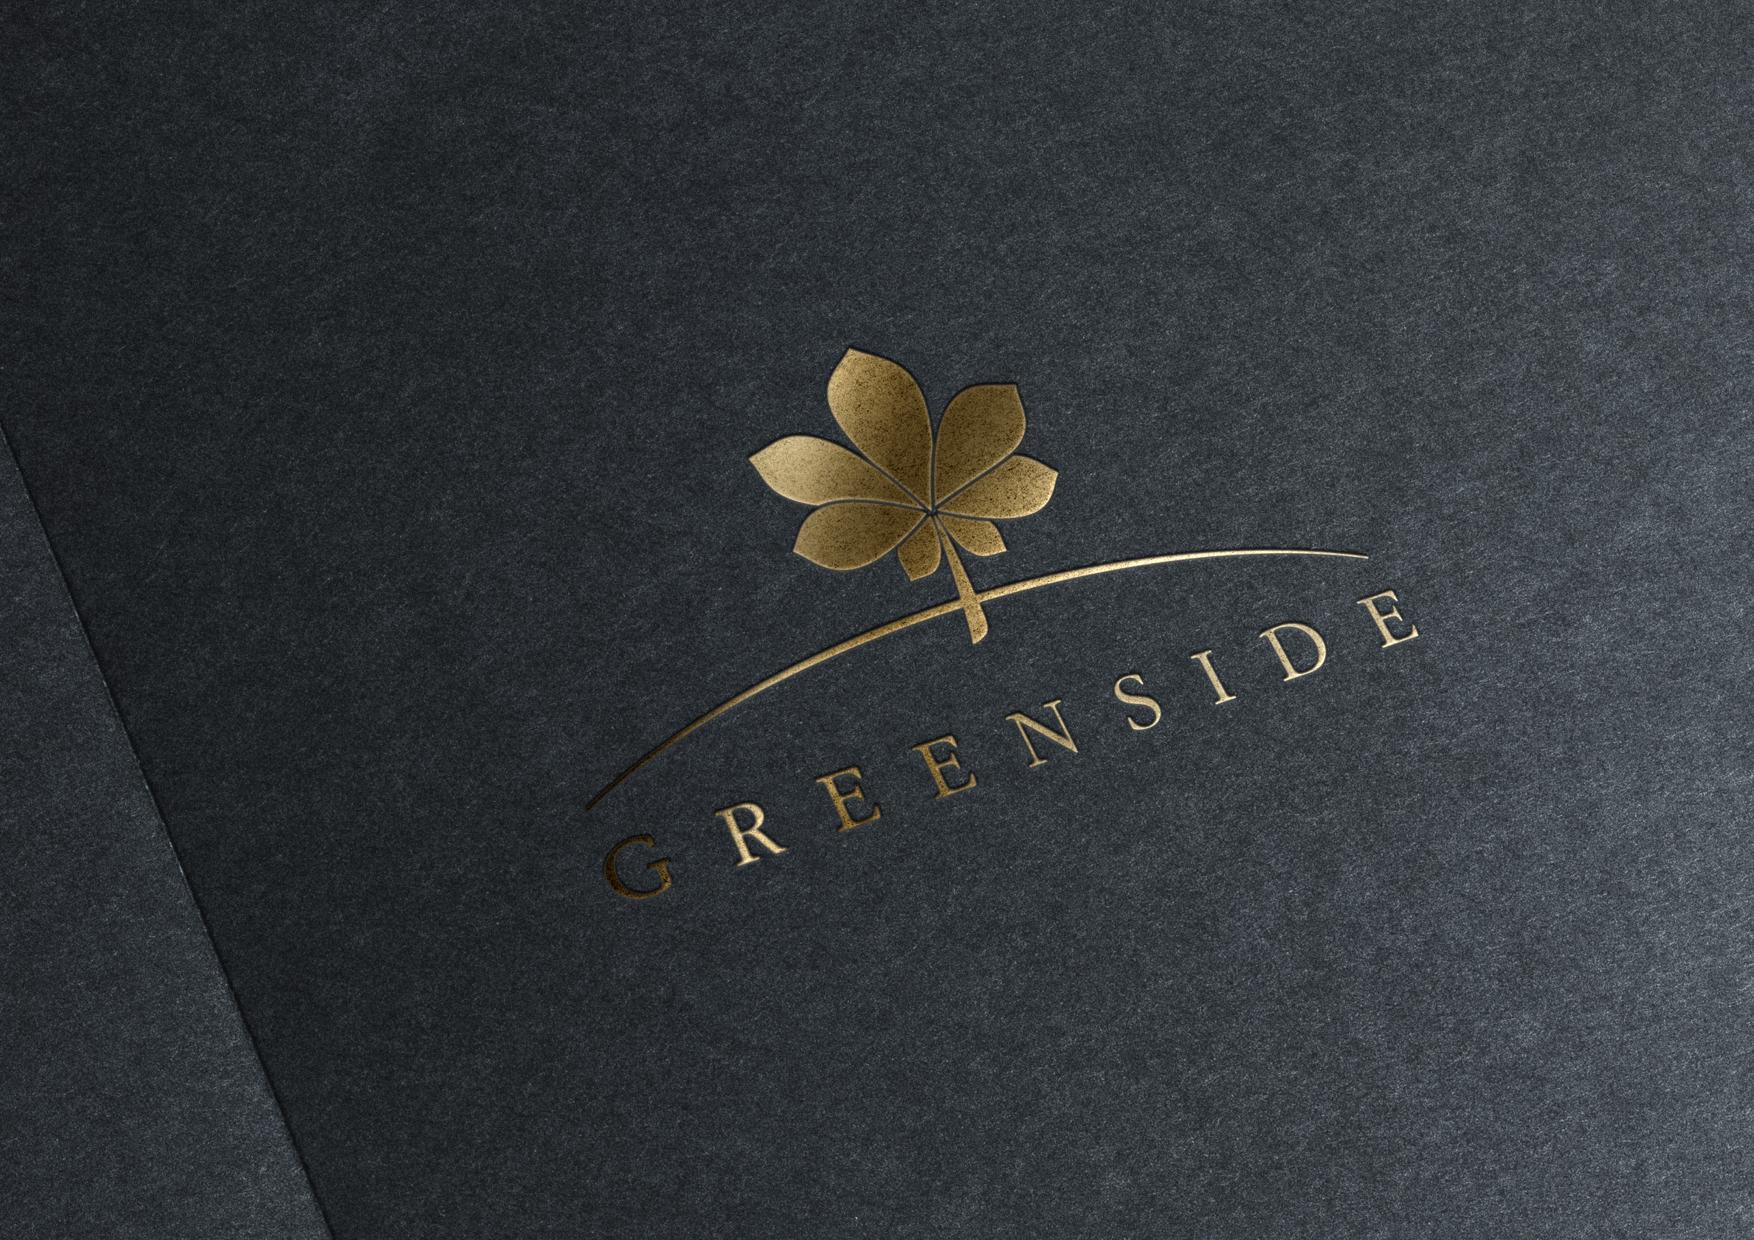 Greenside_Logo